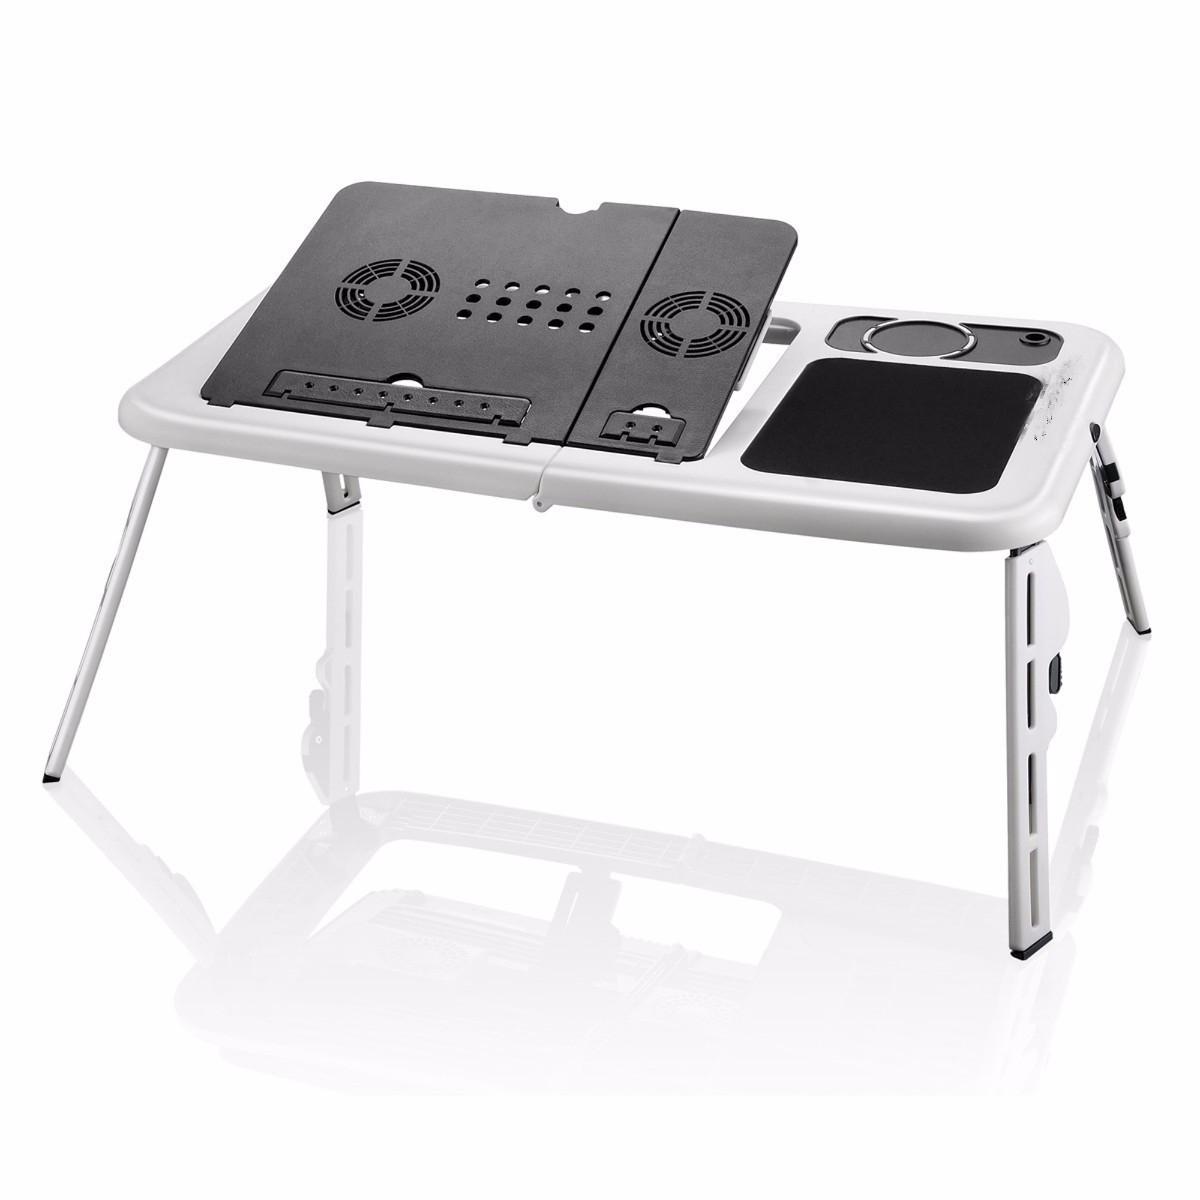 Mesa Portatil Para Netbook e Notebook Com 2 Cooler Retratil Branca (mc40228)